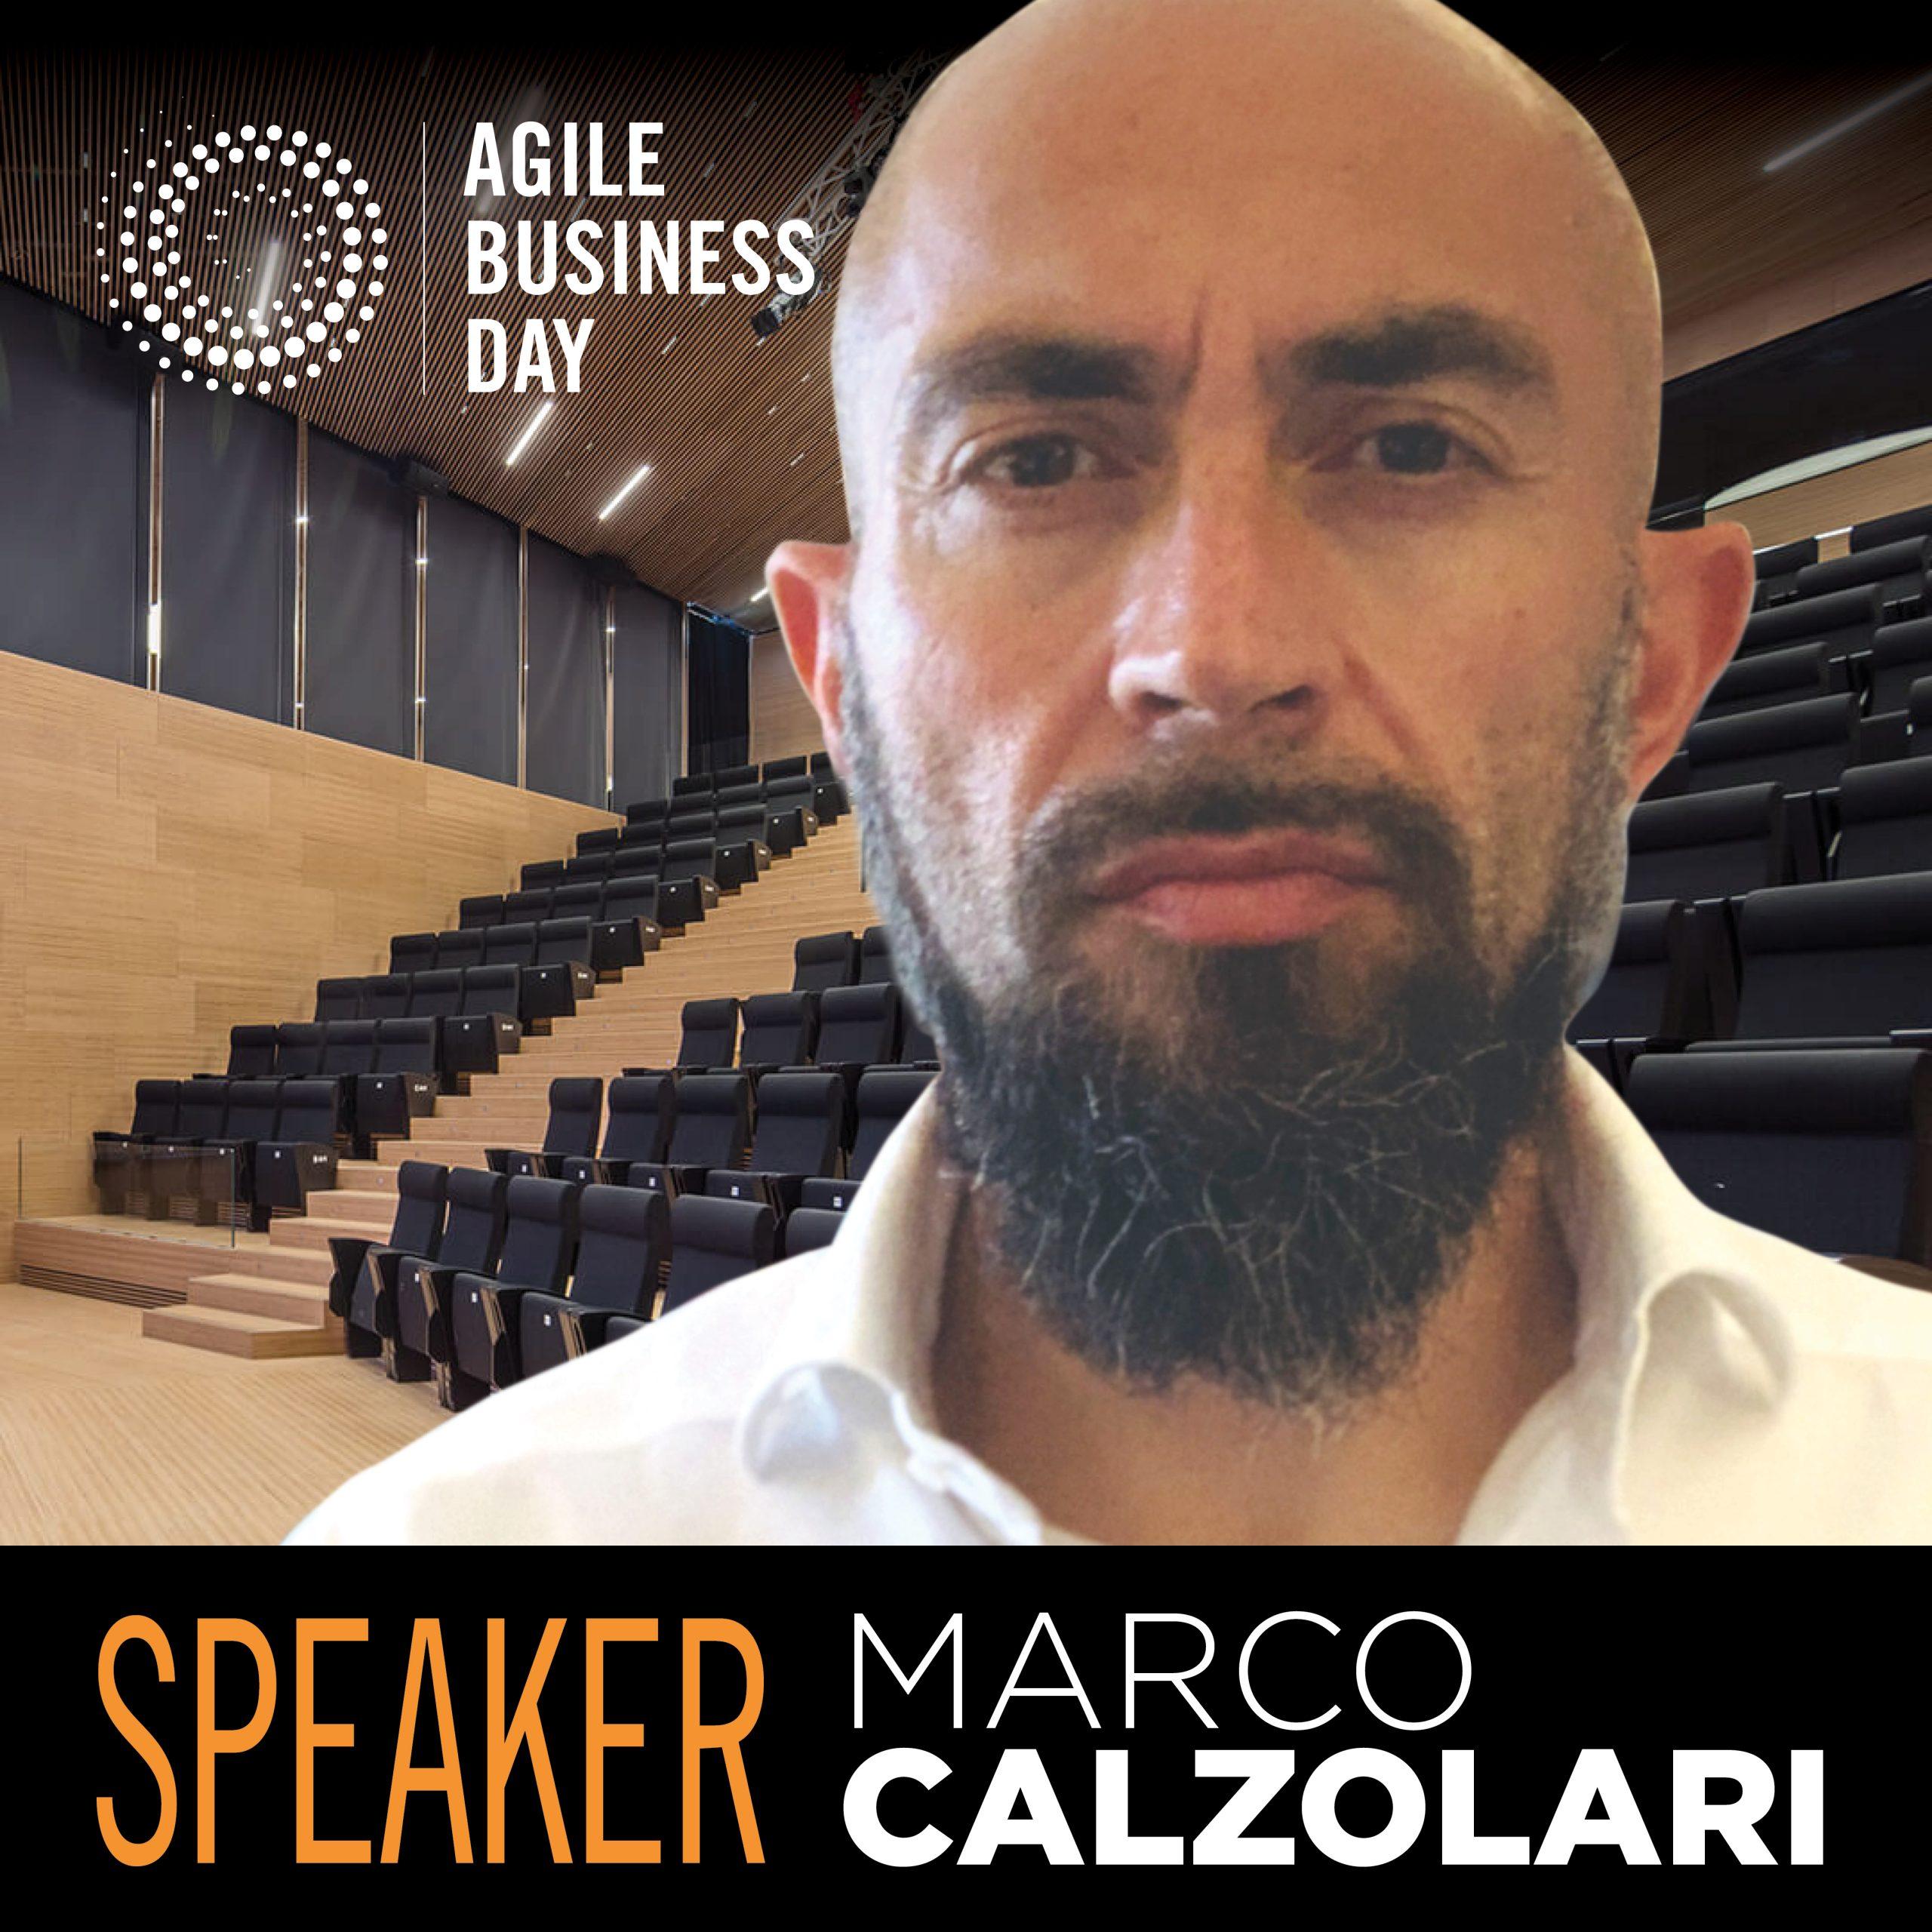 #ABD21 - Marco Calzolari